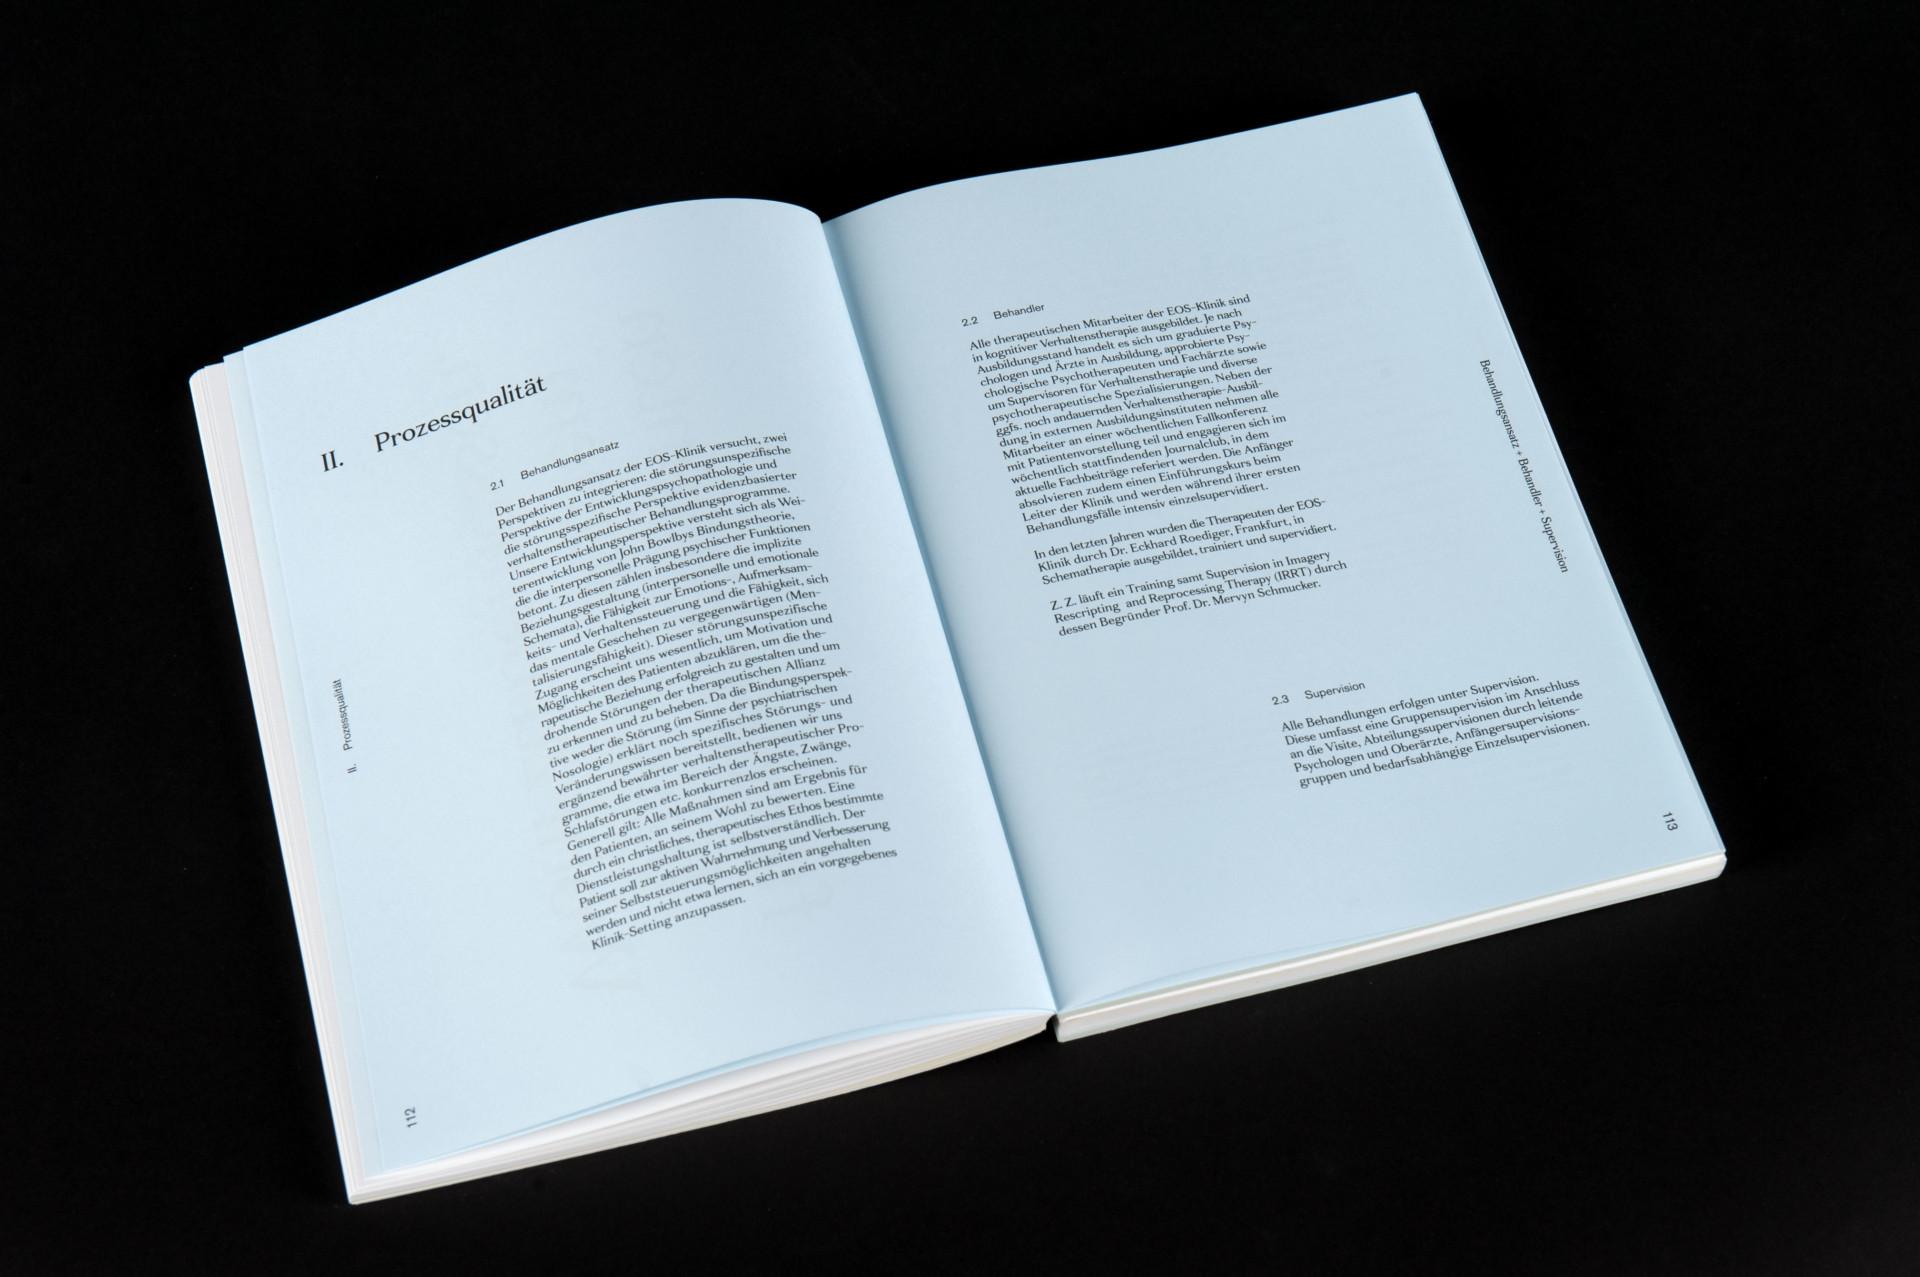 Amélie Graef – Graphicdesign & Art Direction EOS Qualitätsbericht